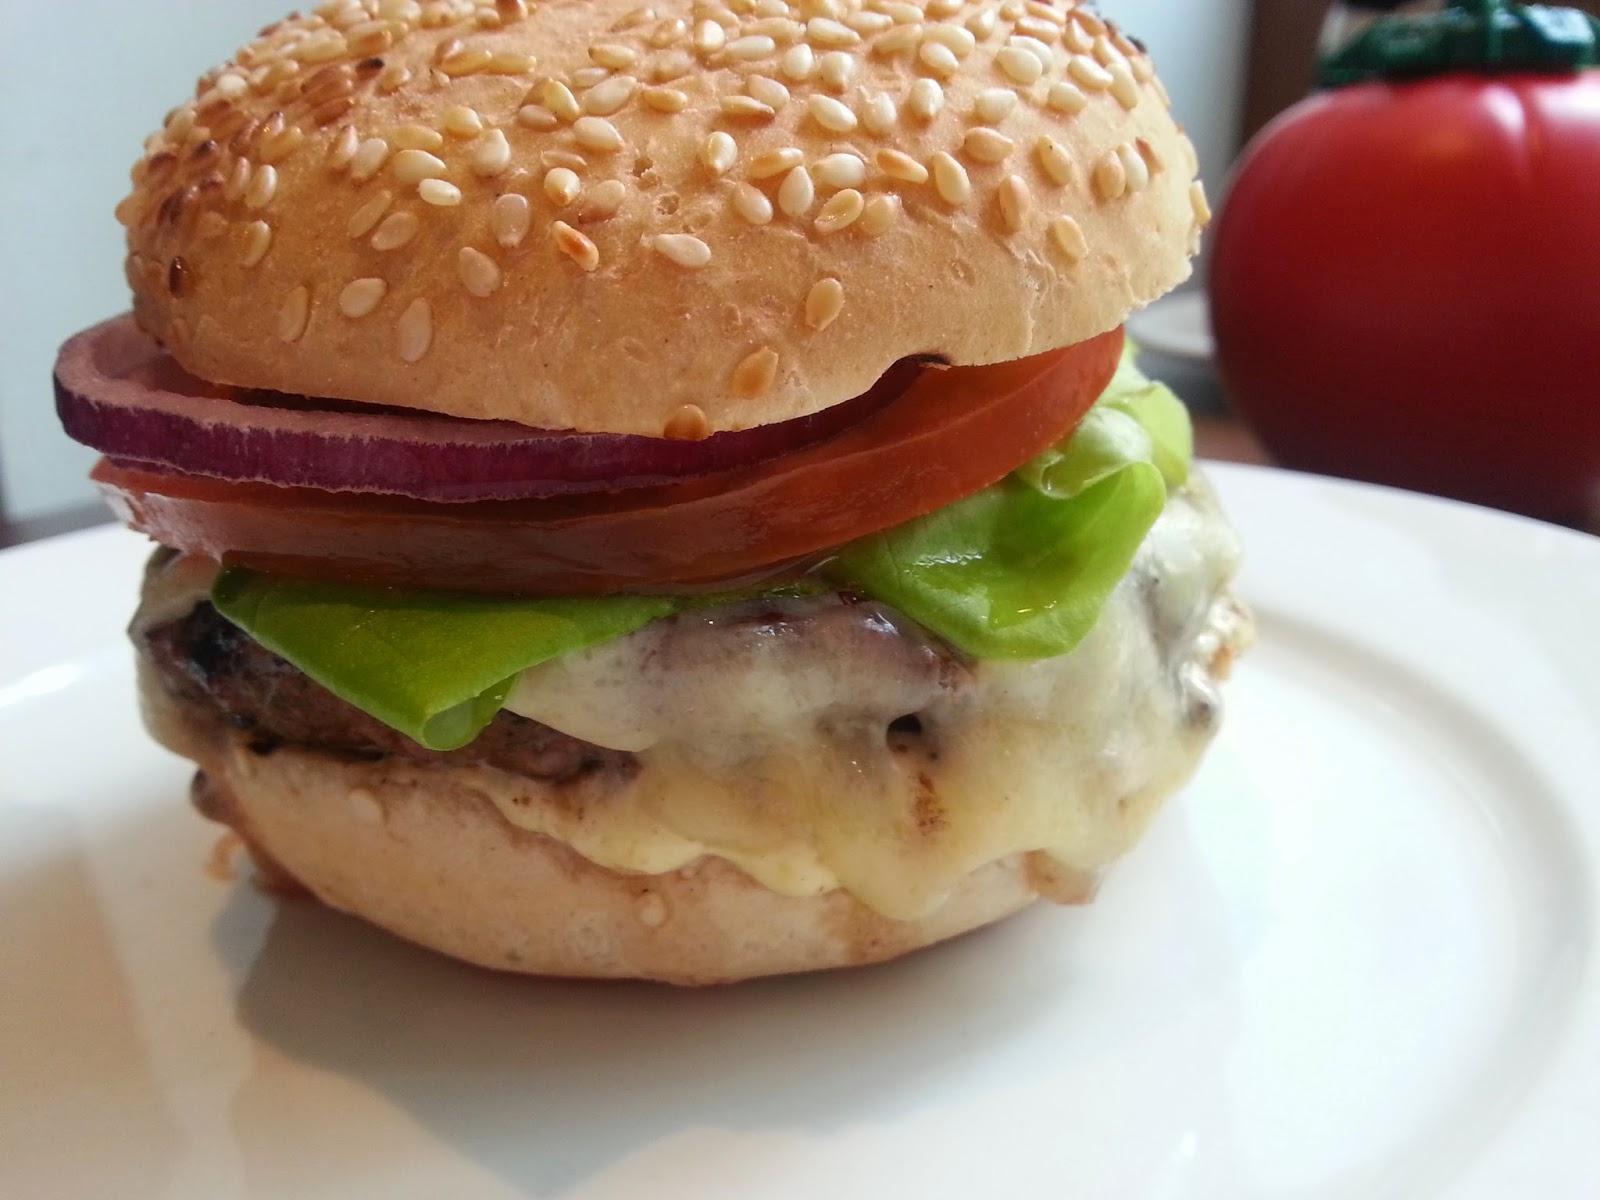 Burger Me A London Burger Blog Burger Business Gbk Launches The